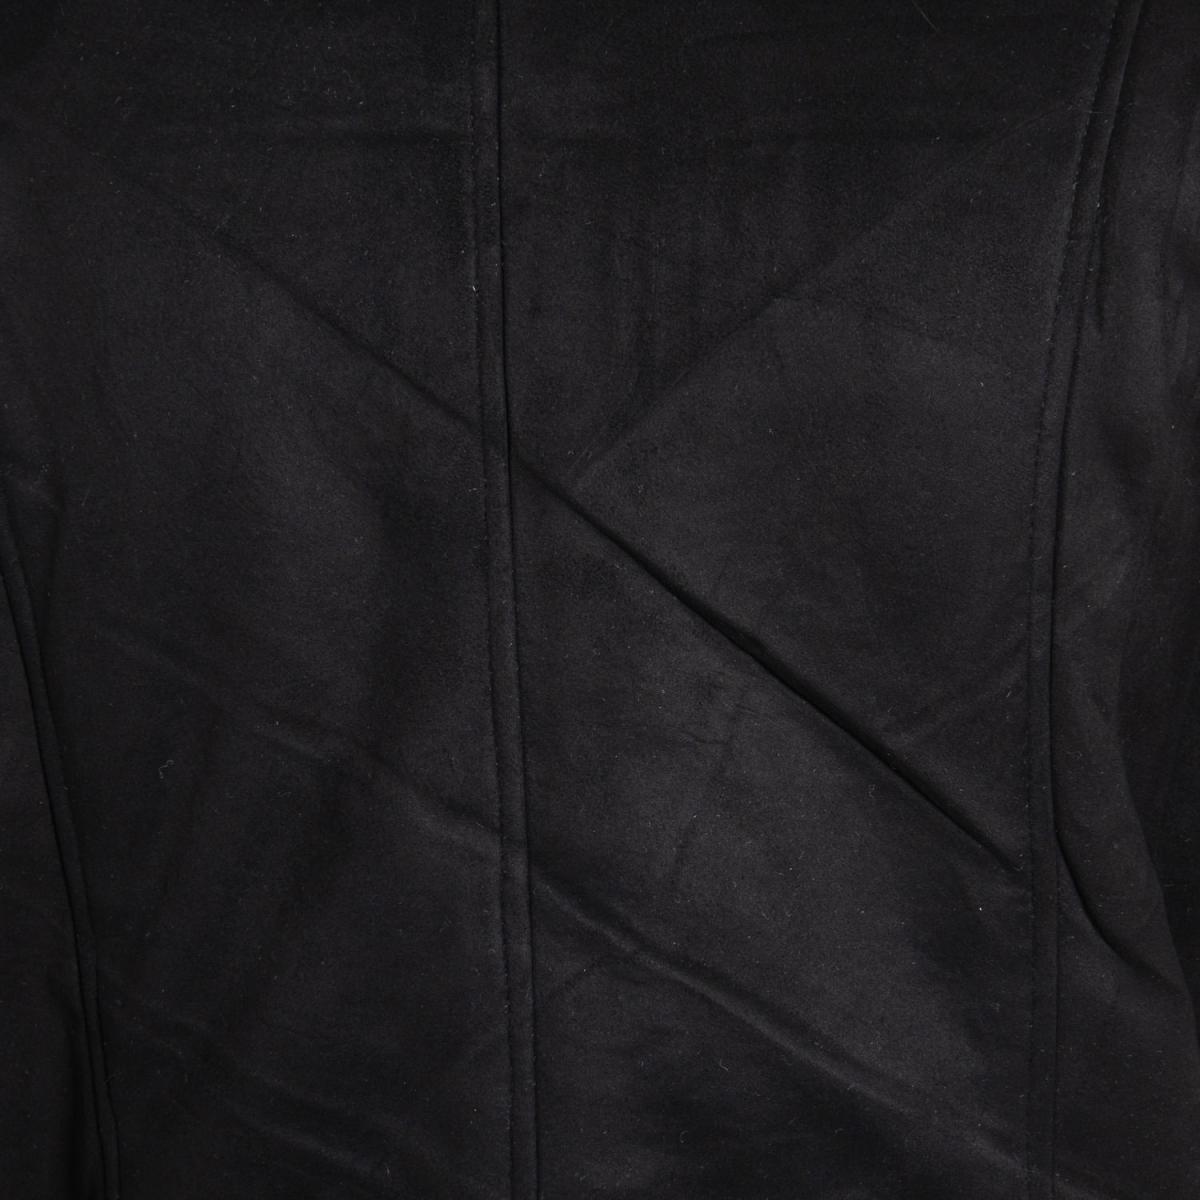 abbigliamento Giubbini uomo Giubbino scamosciato LPP1660 LANDEK PARK Cafedelmar Shop